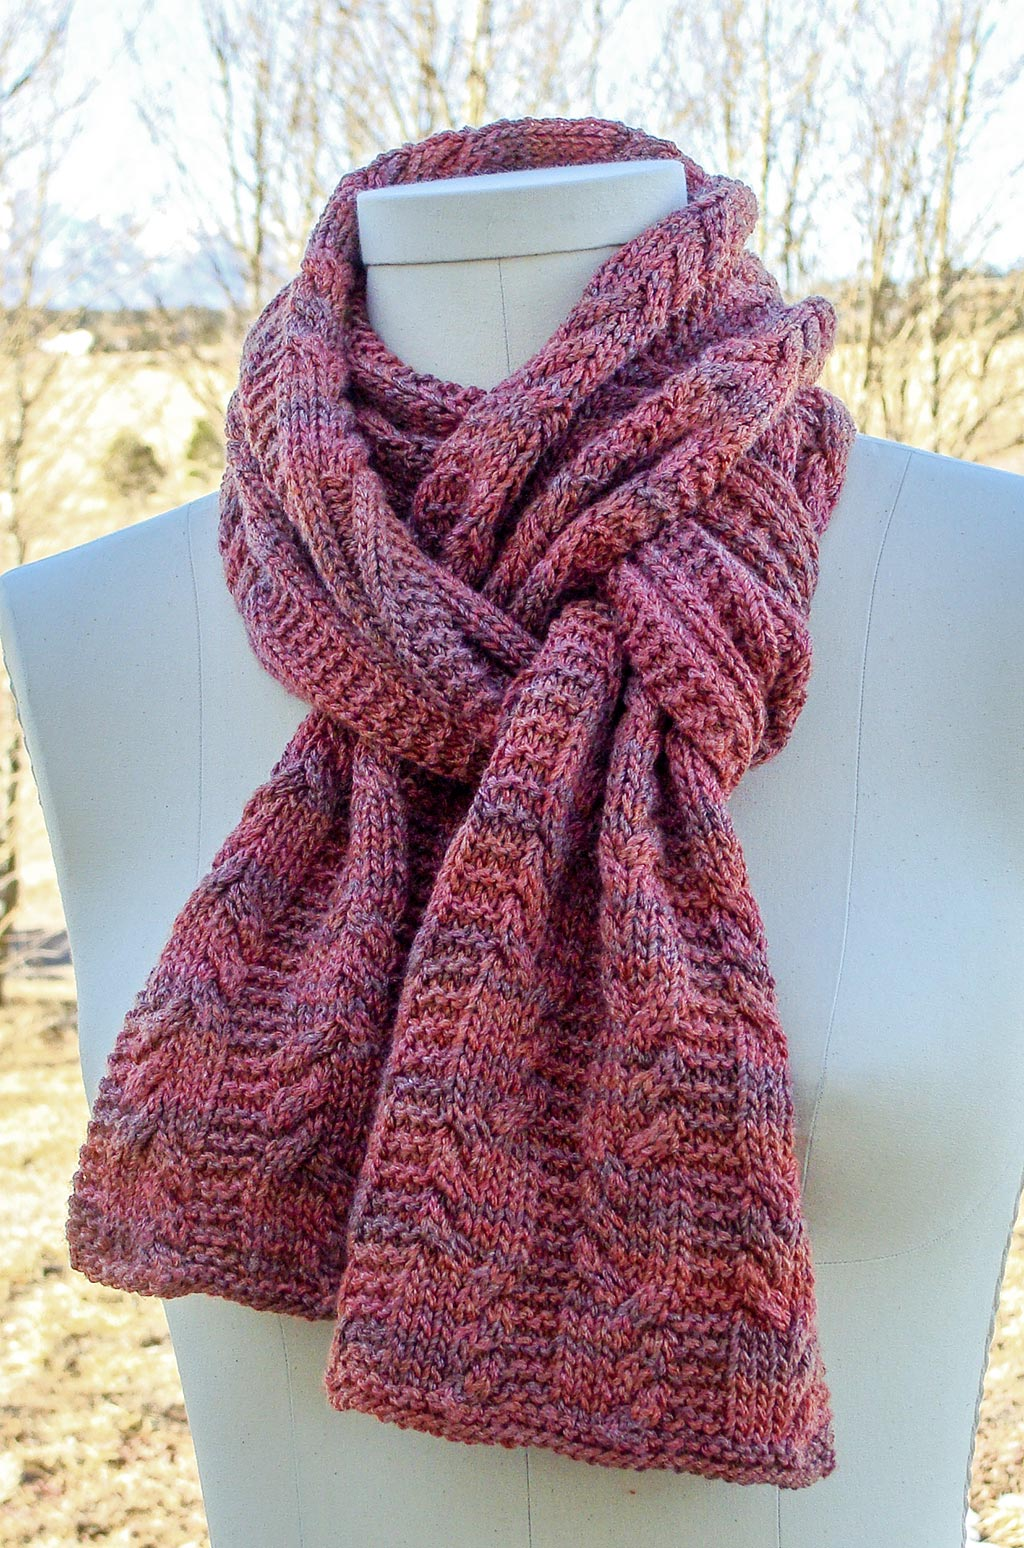 deriva seaman scarf